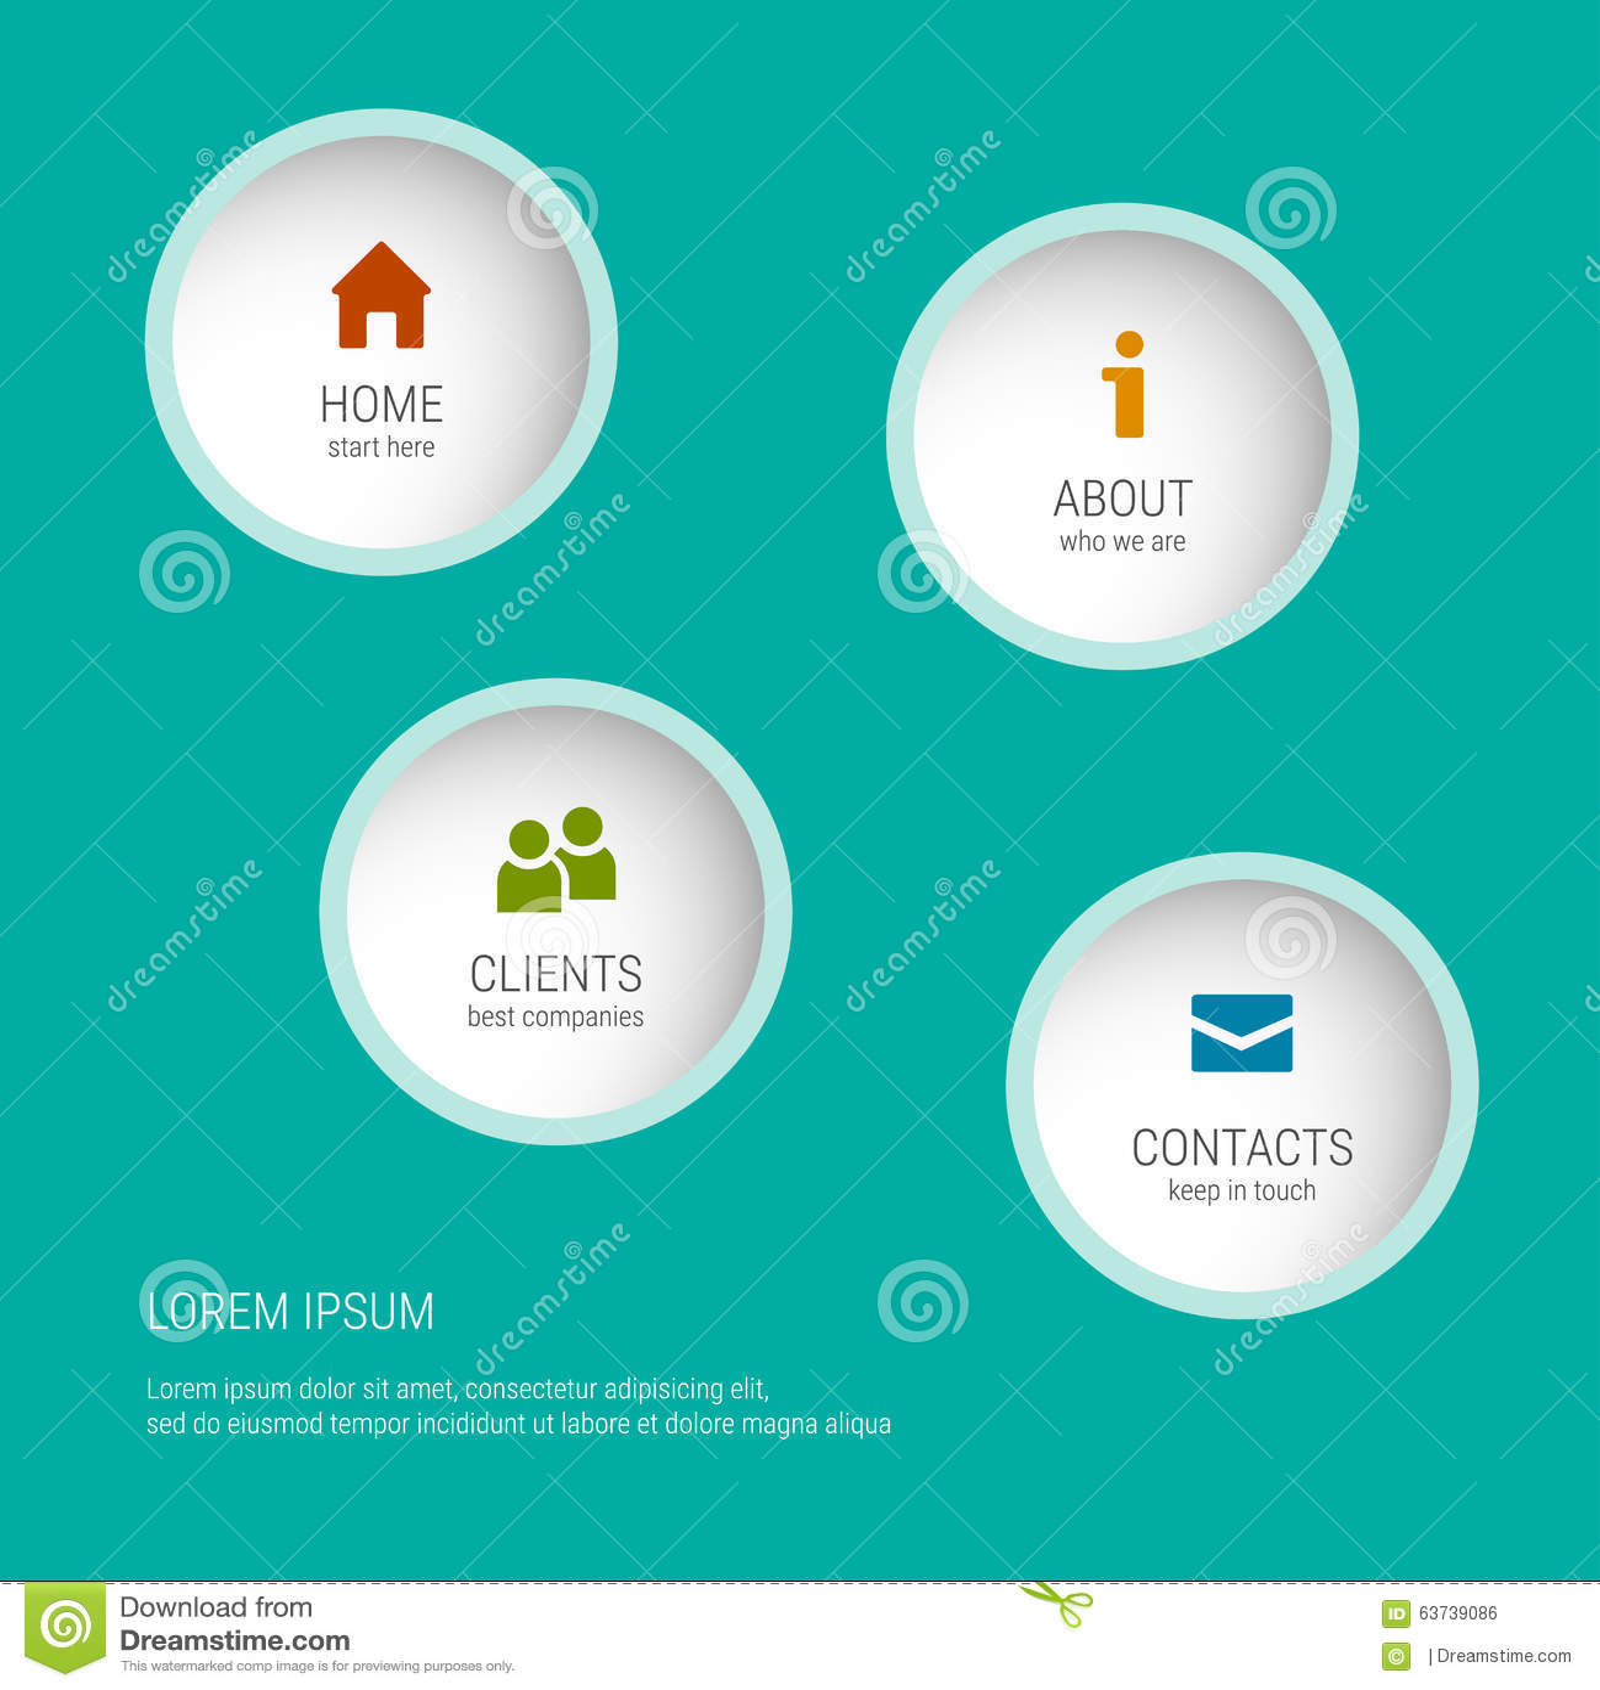 Website soft colors - Royalty Free Illustration Download The Modern Soft Color